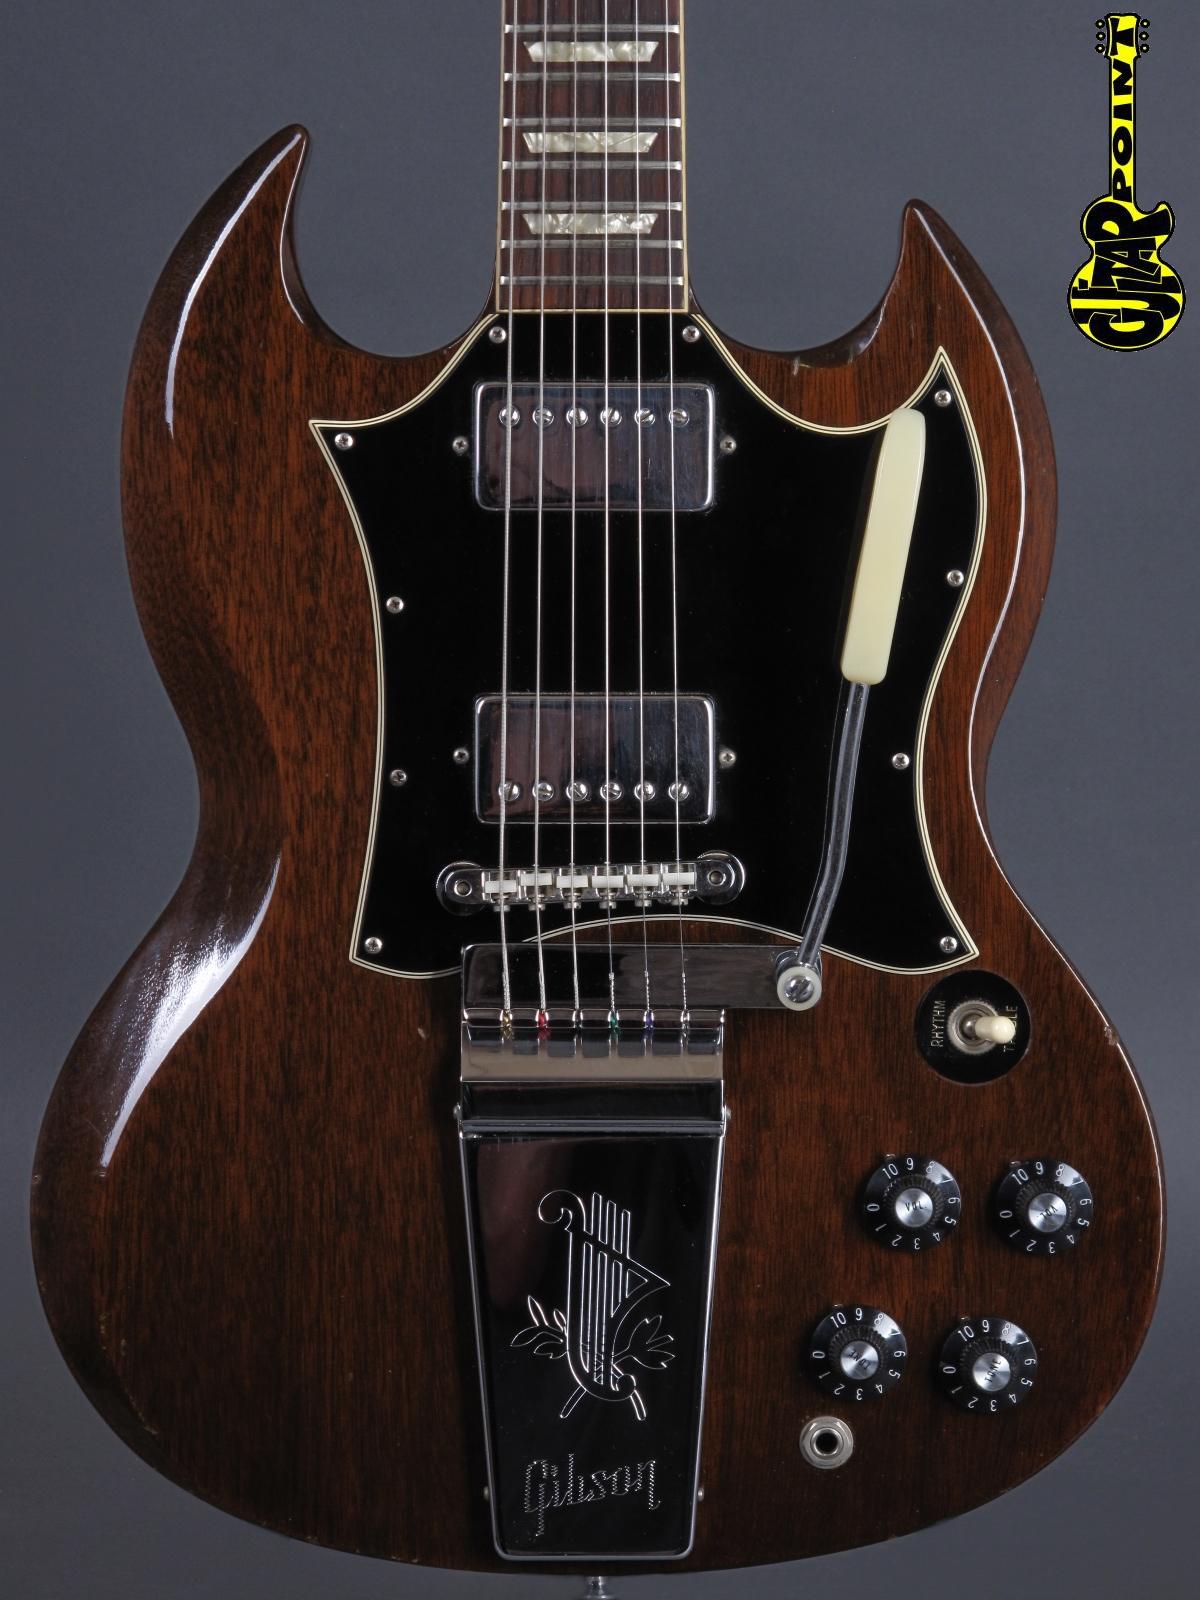 1970 Gibson SG Standard - Walnut